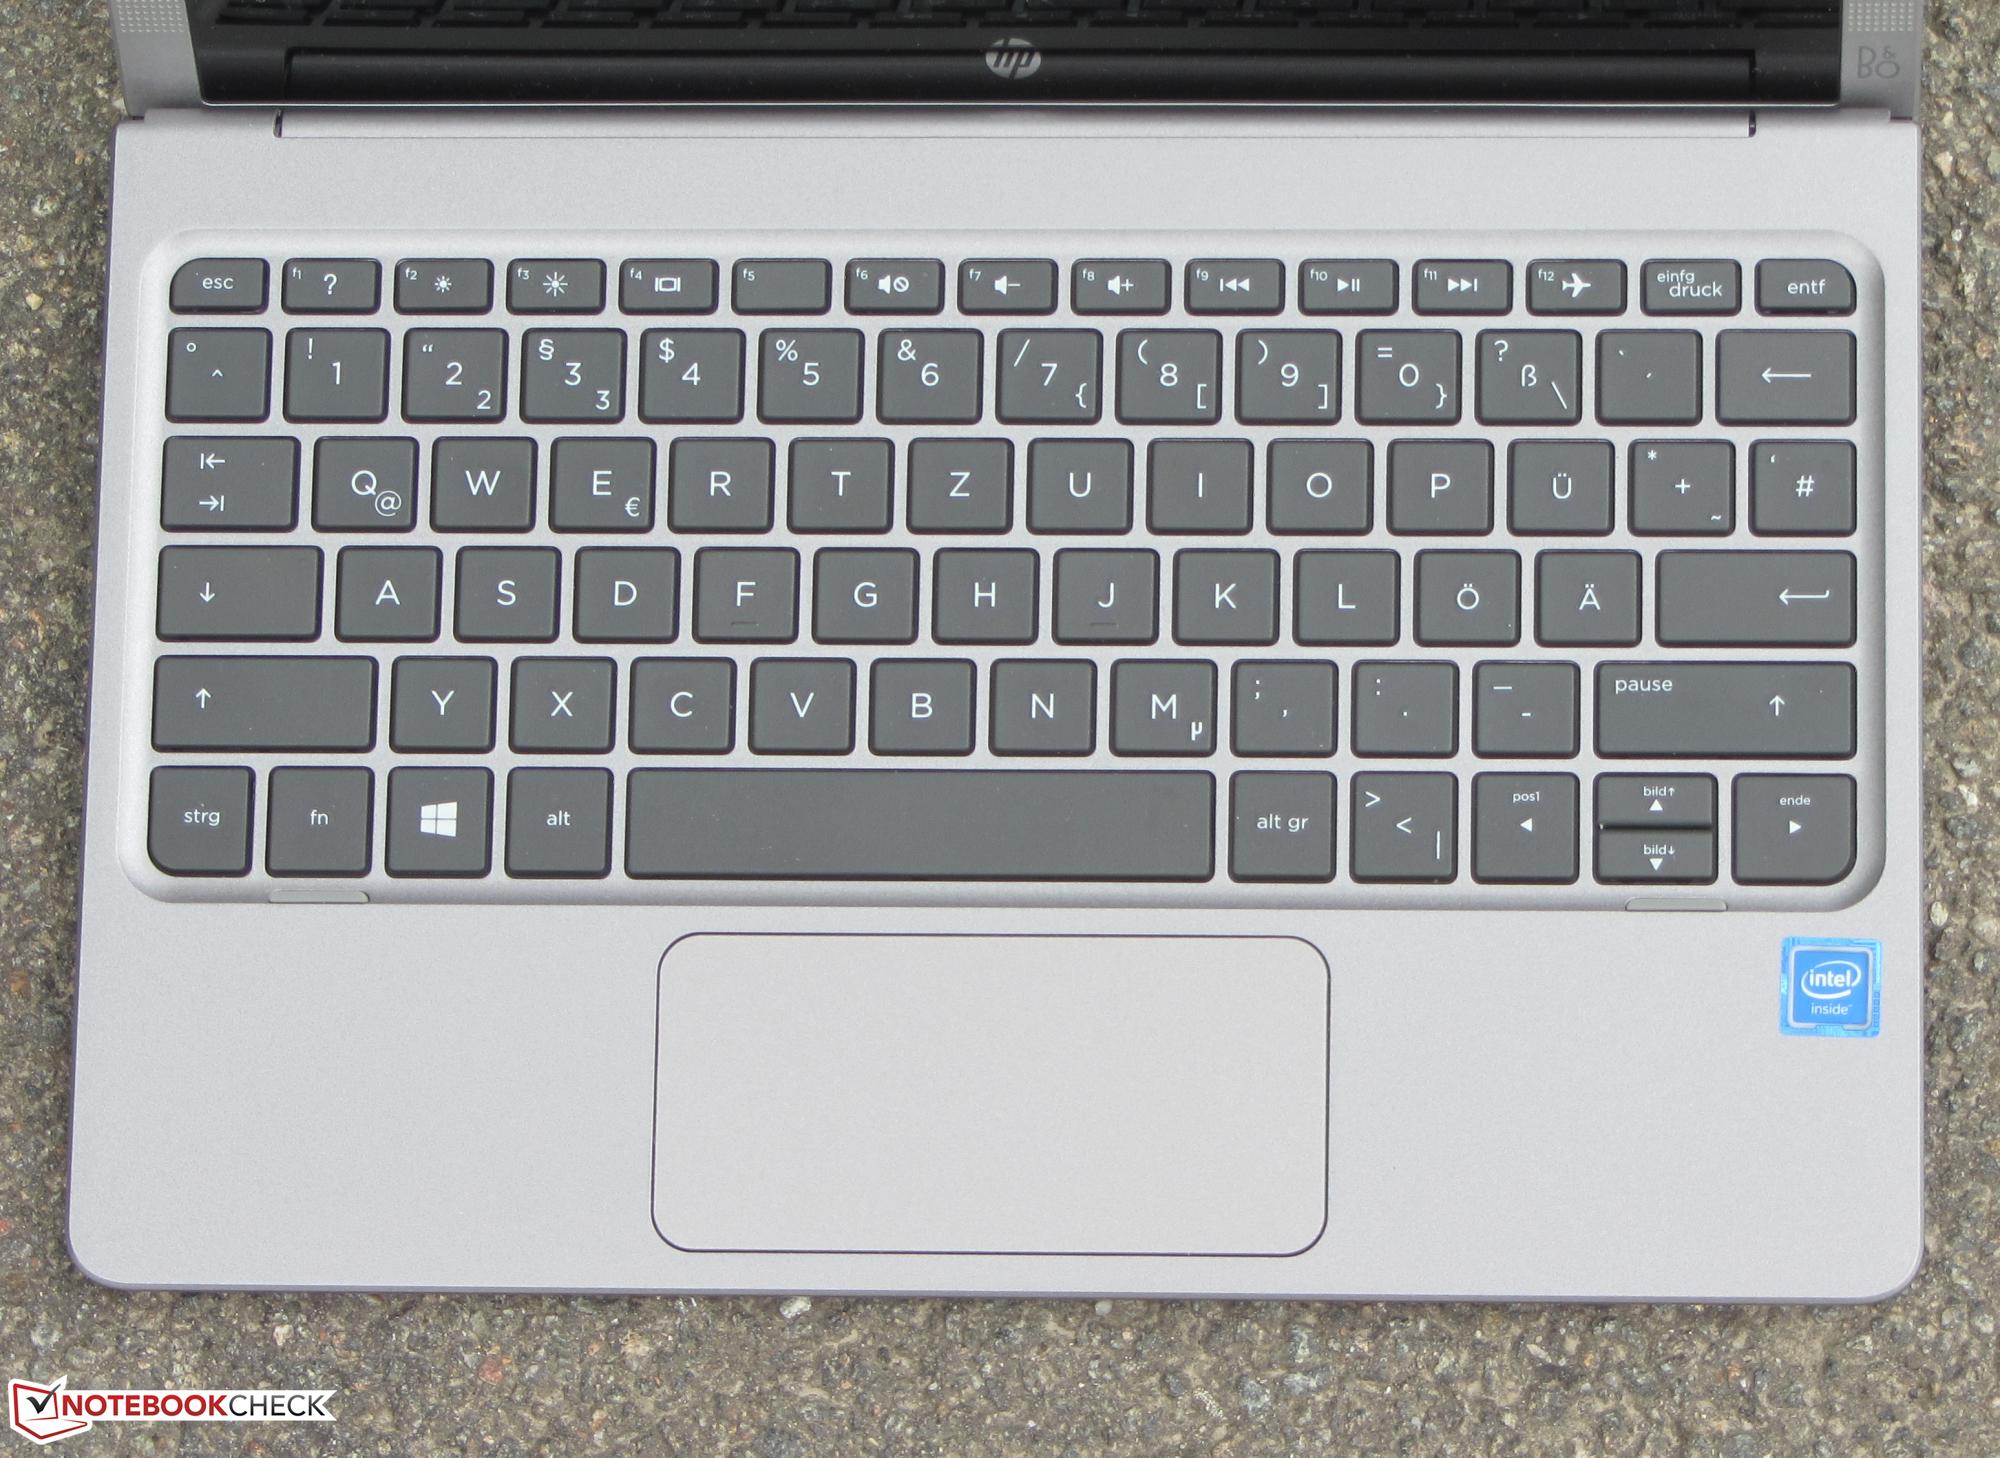 HP x2 210 G1 Convertible Review - NotebookCheck net Reviews